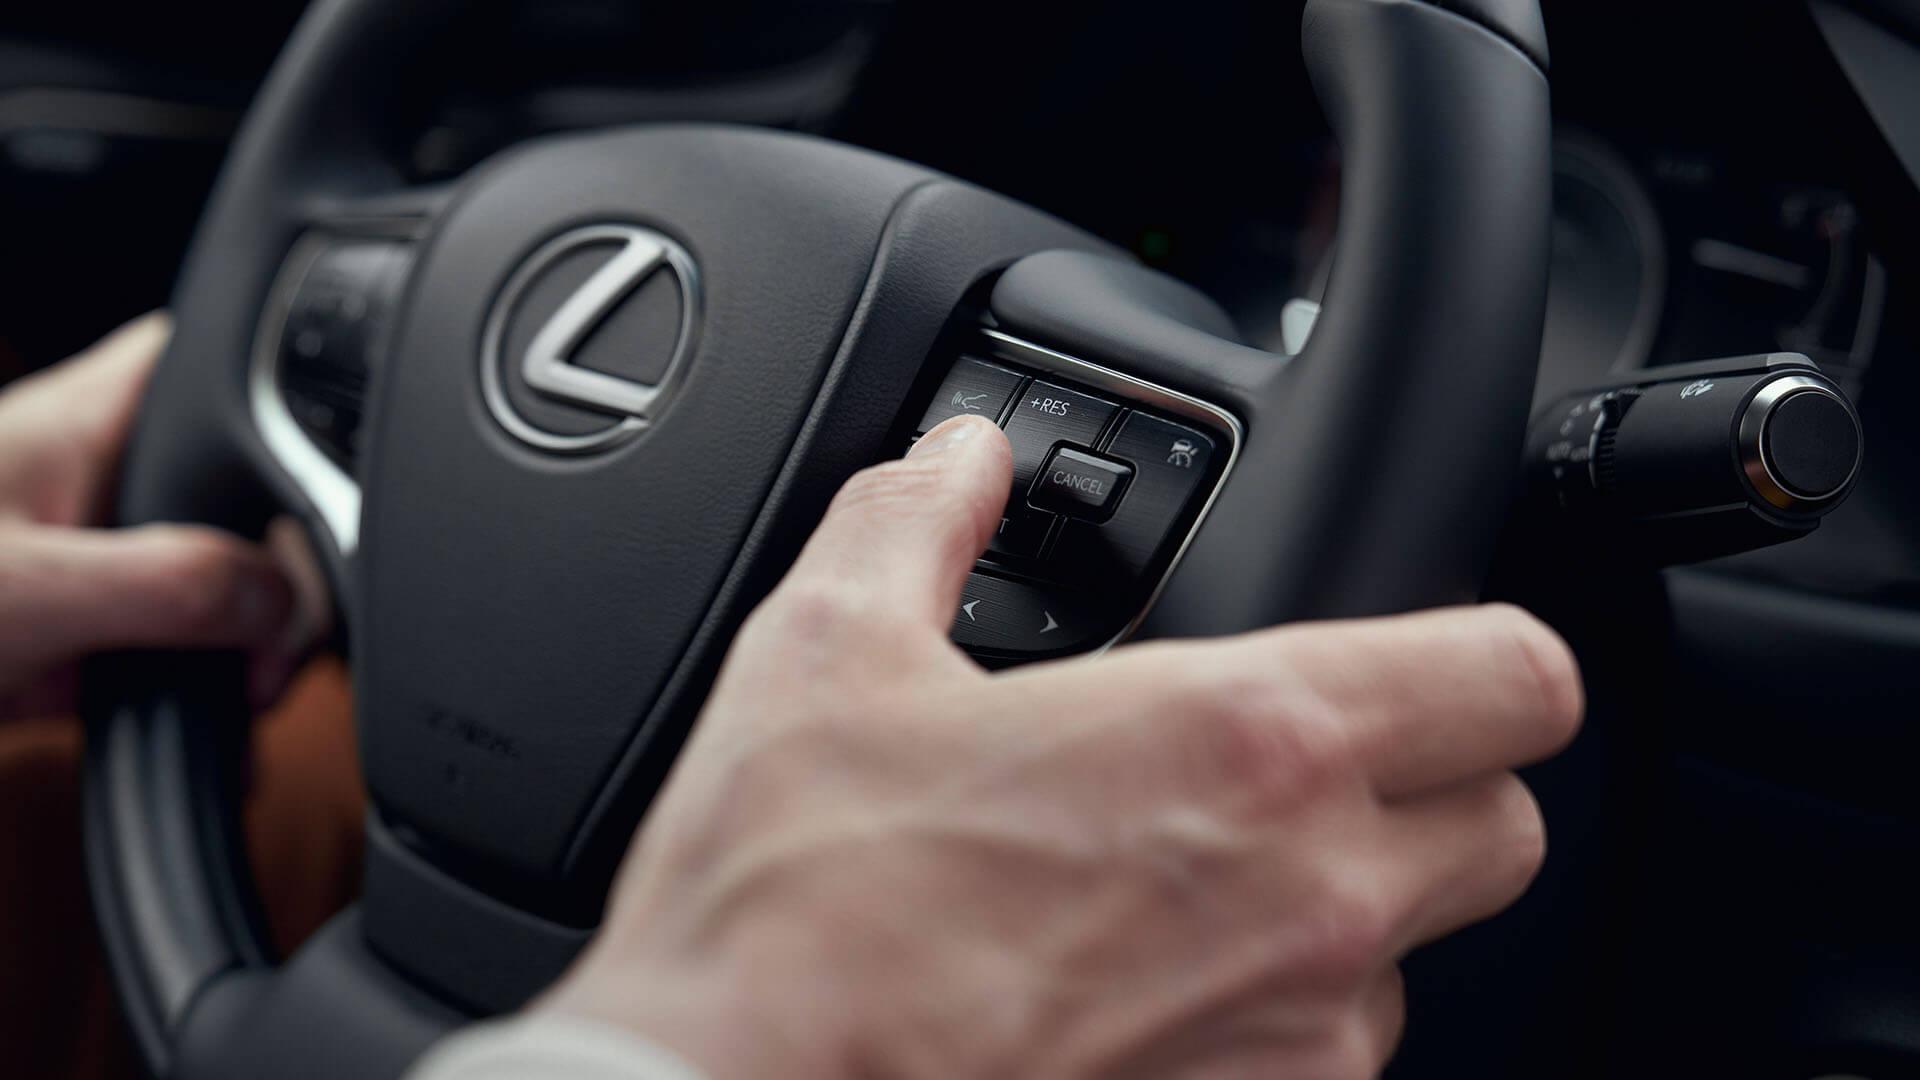 2022 lexus es experience interior front leather steering wheel